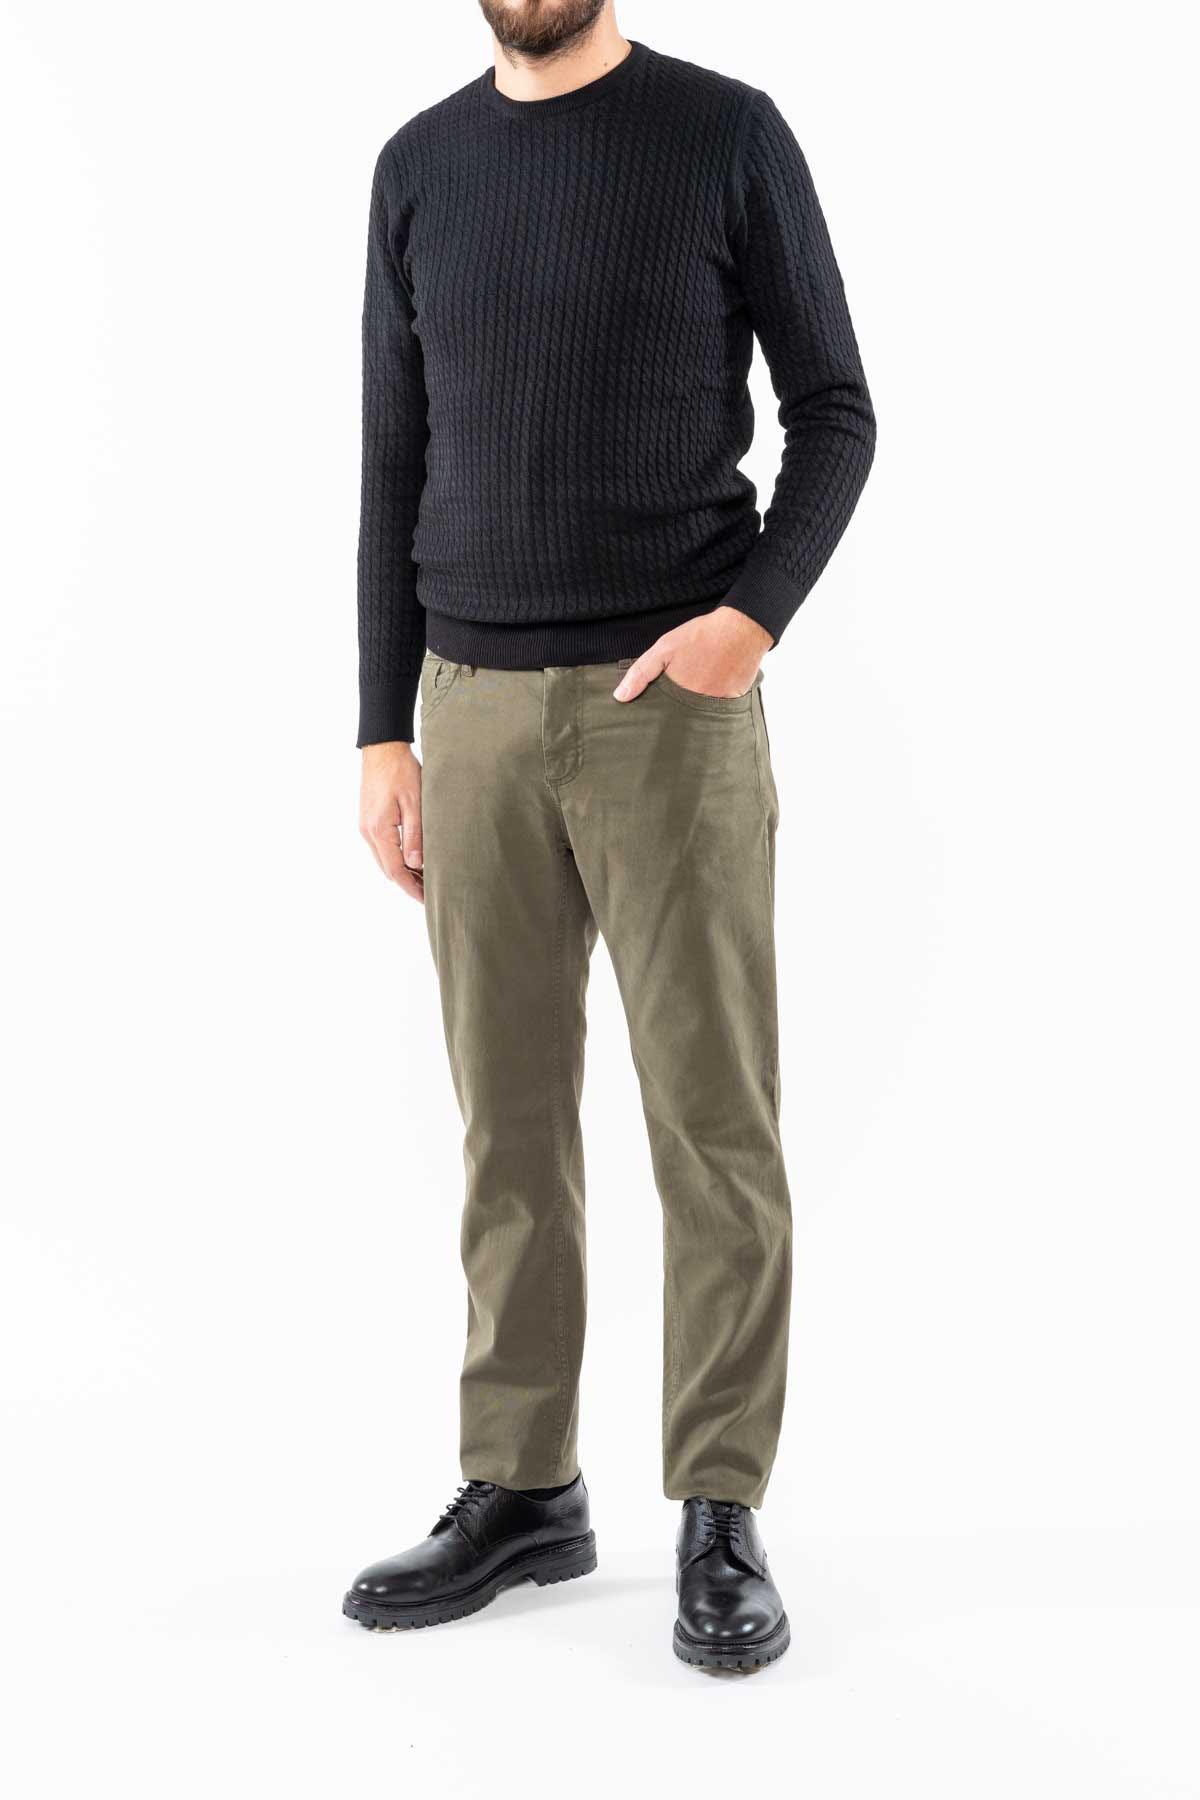 pantalone,verde